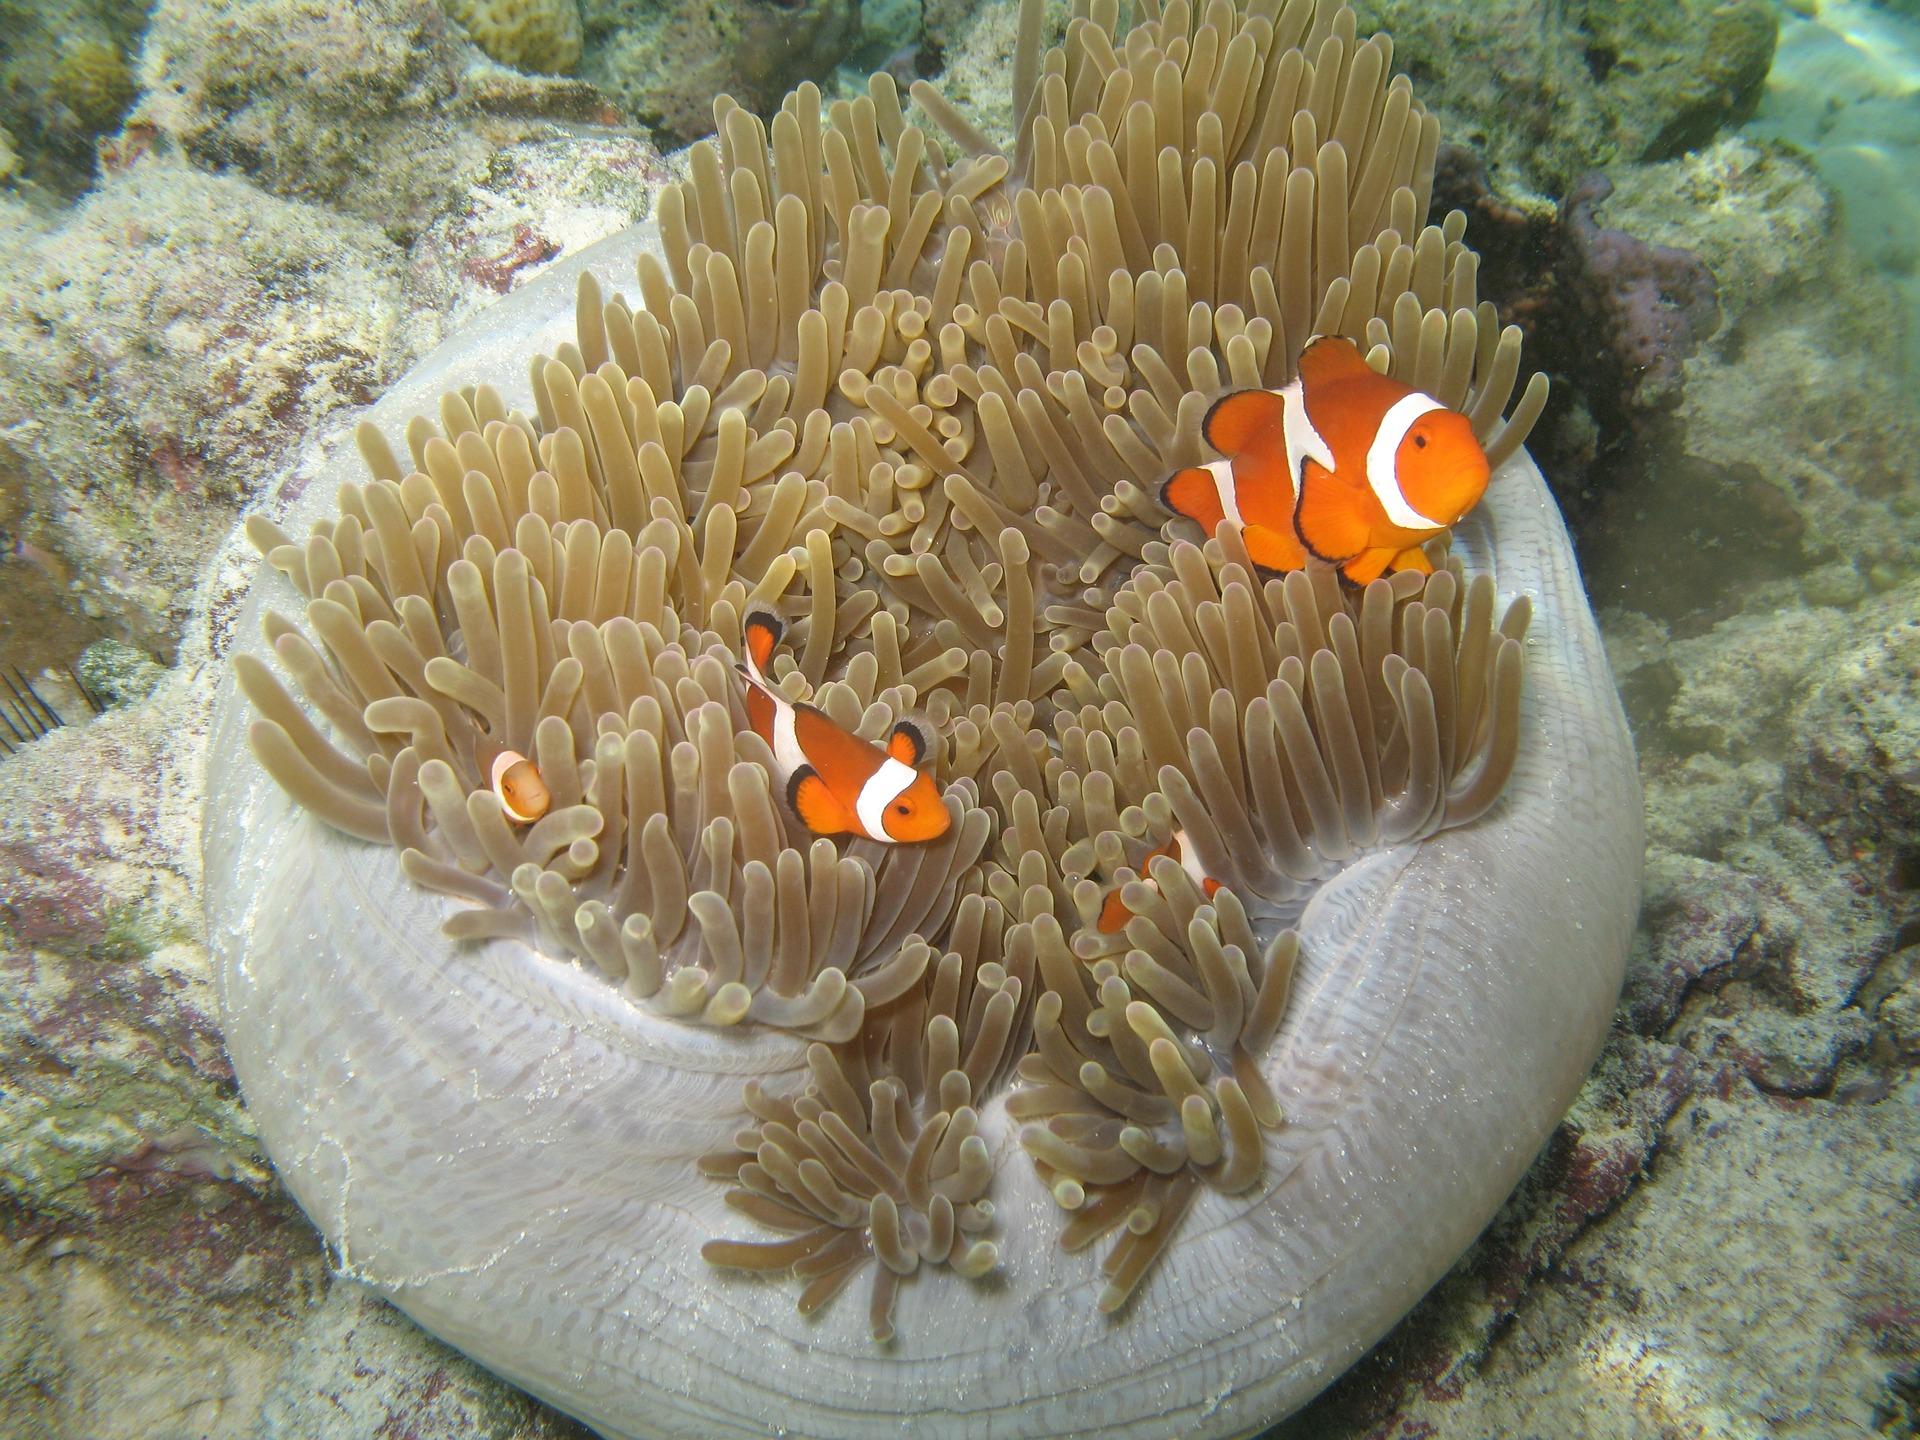 clown-fish-1415706_1920.jpg